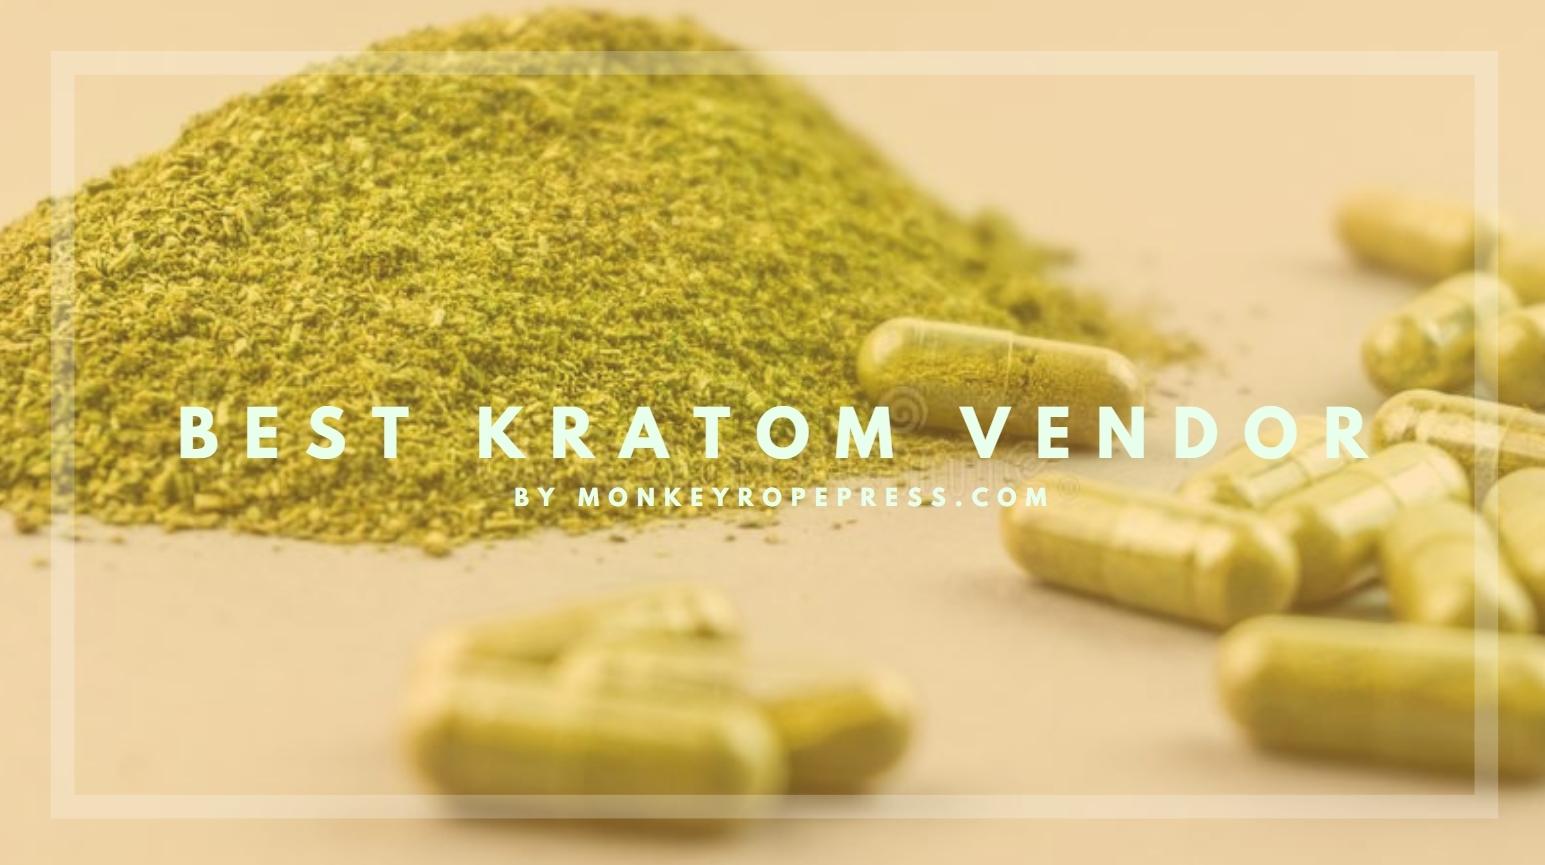 Top Kratom Vendors List in 2020